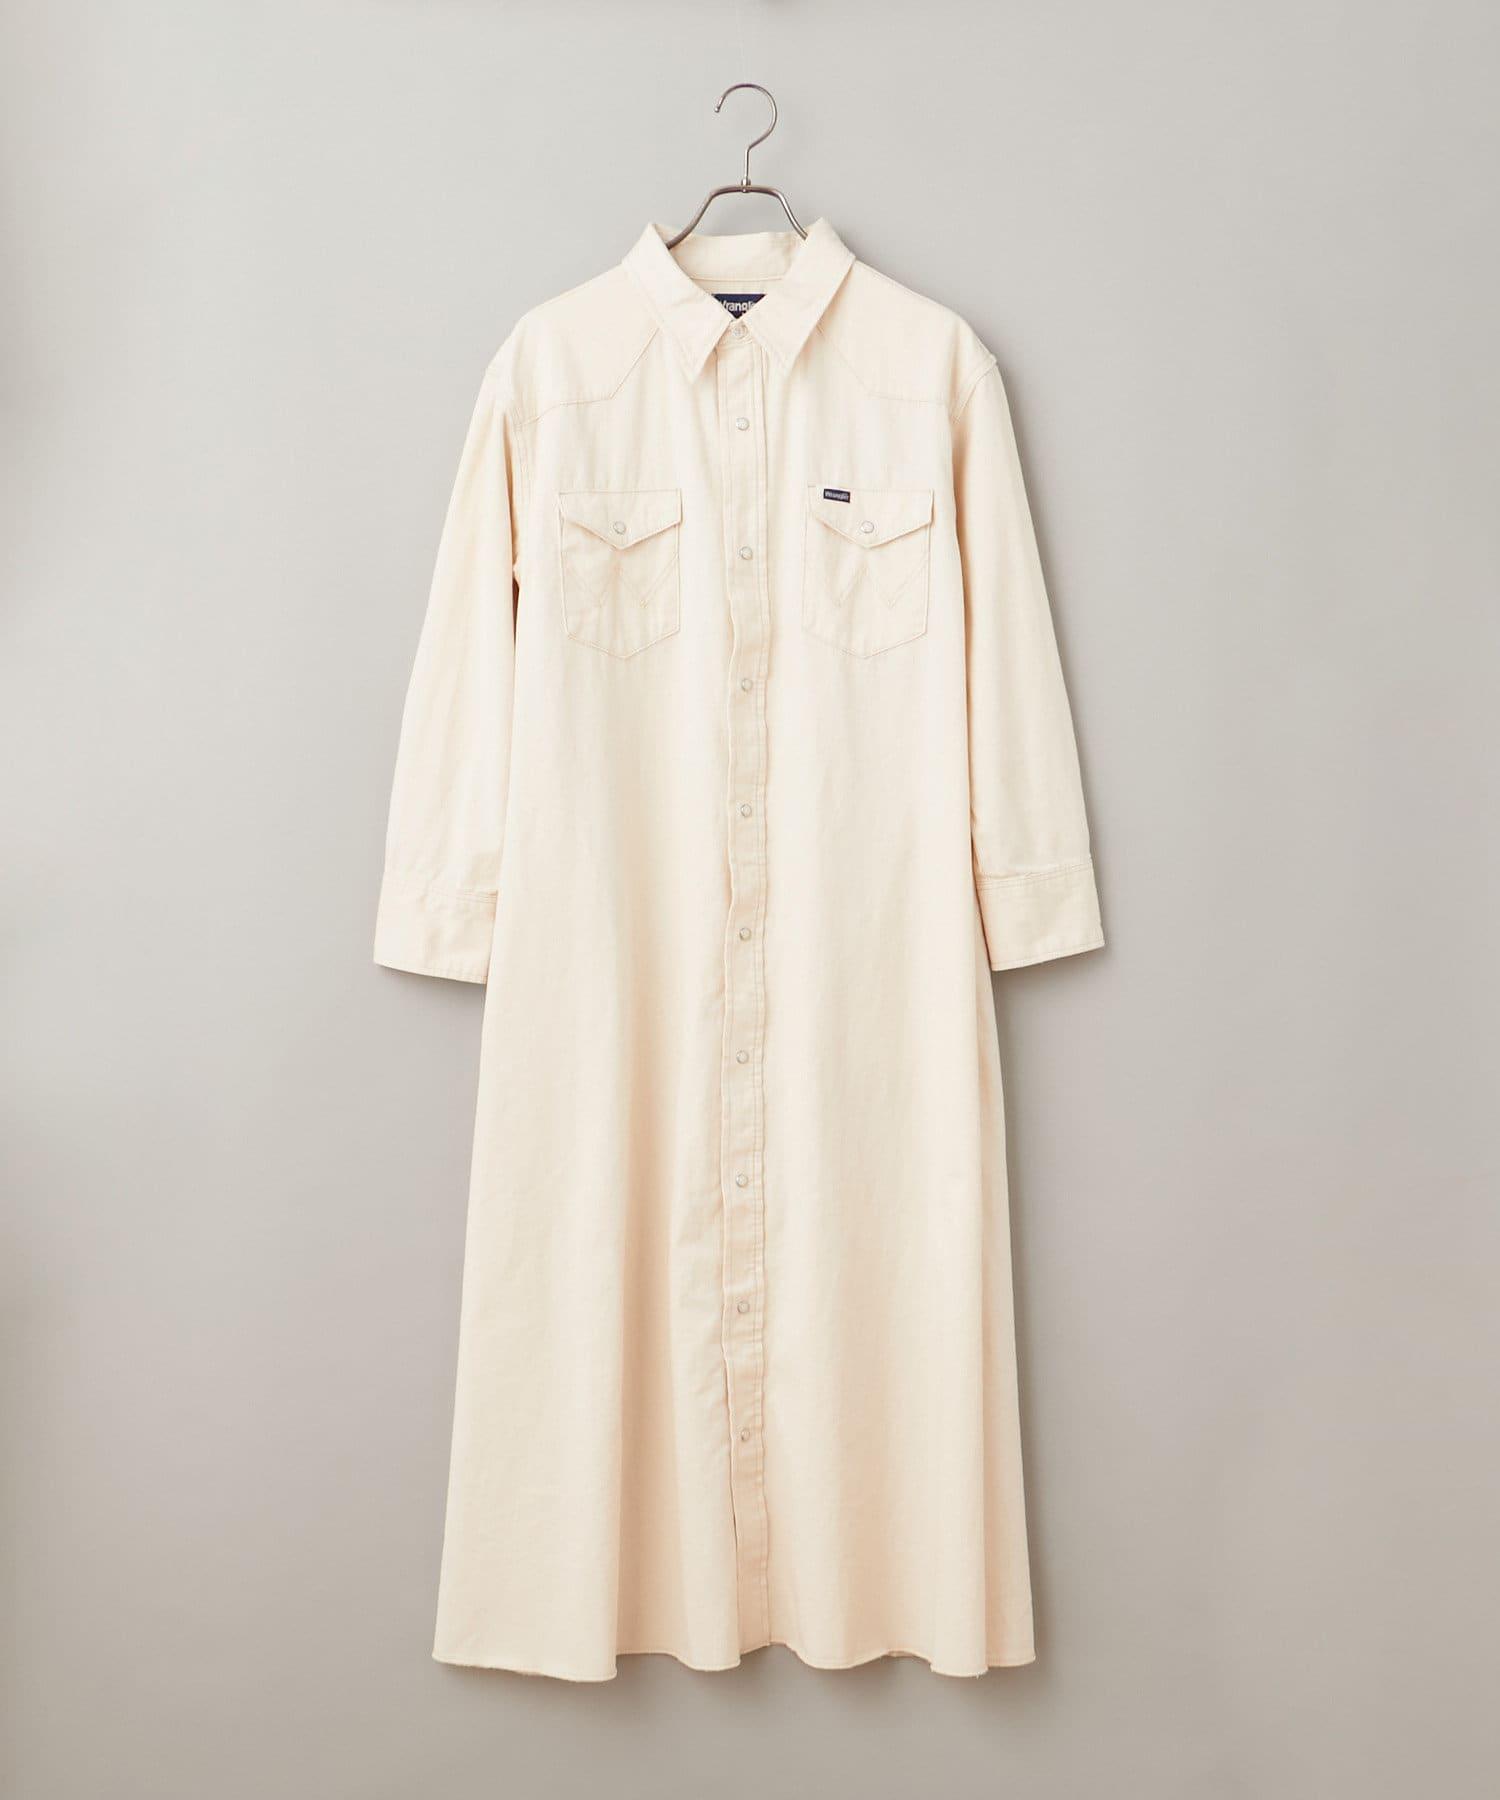 CIAOPANIC(チャオパニック) レディース 【Wrangler】WESTERN SHIRTS DRESS アイボリー